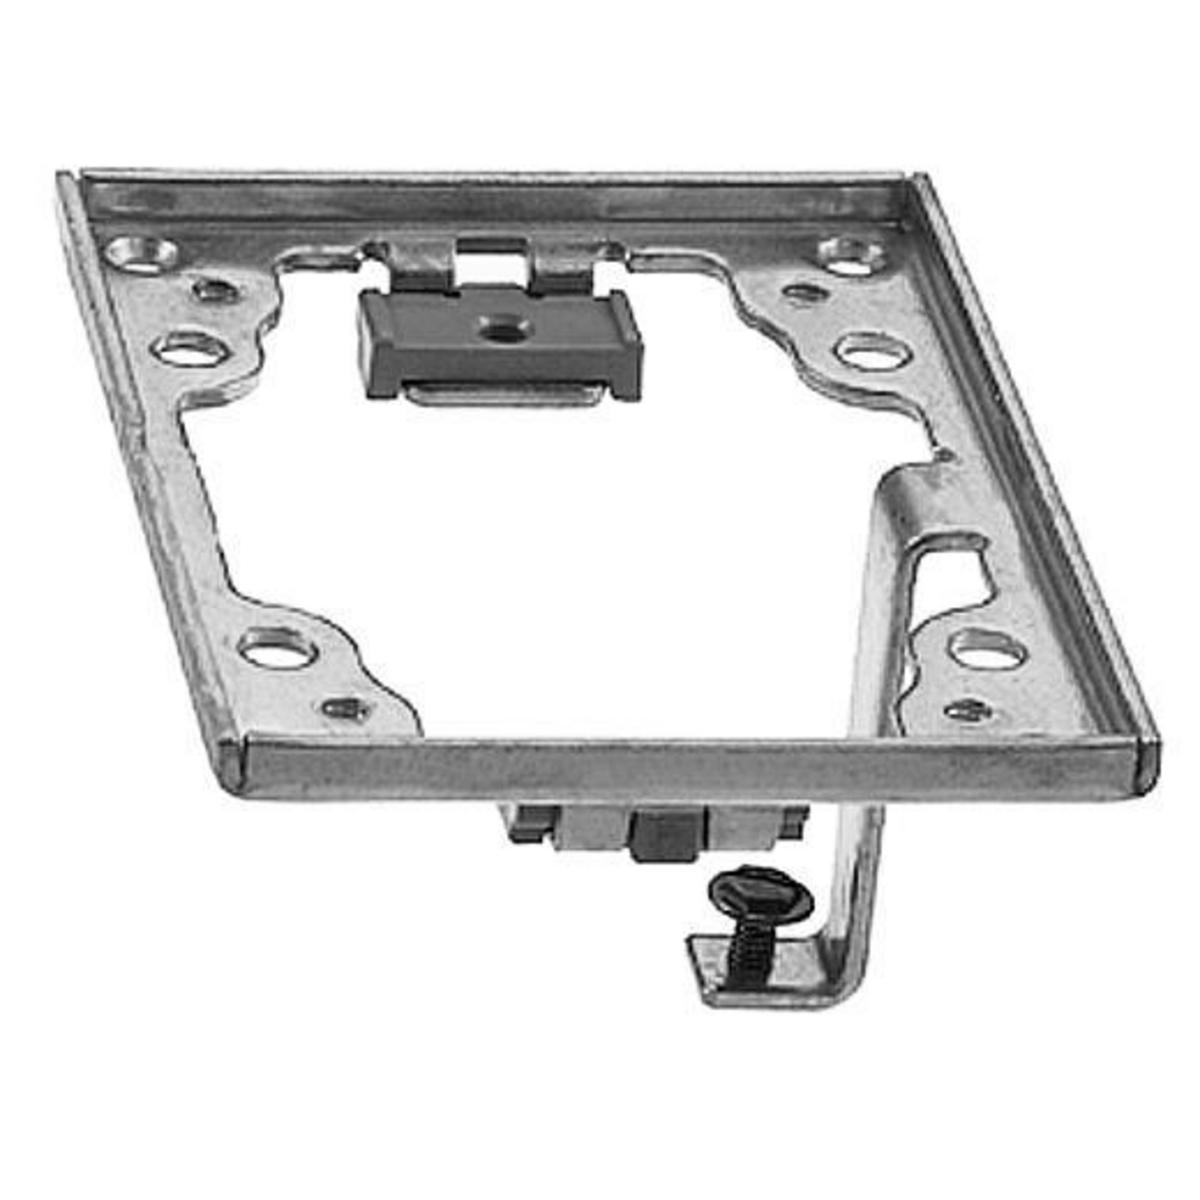 Hubbell SA5017G 4.36 x 3.2 Inch Aluminum Rectangular Adapter Frame with Grounding Lug